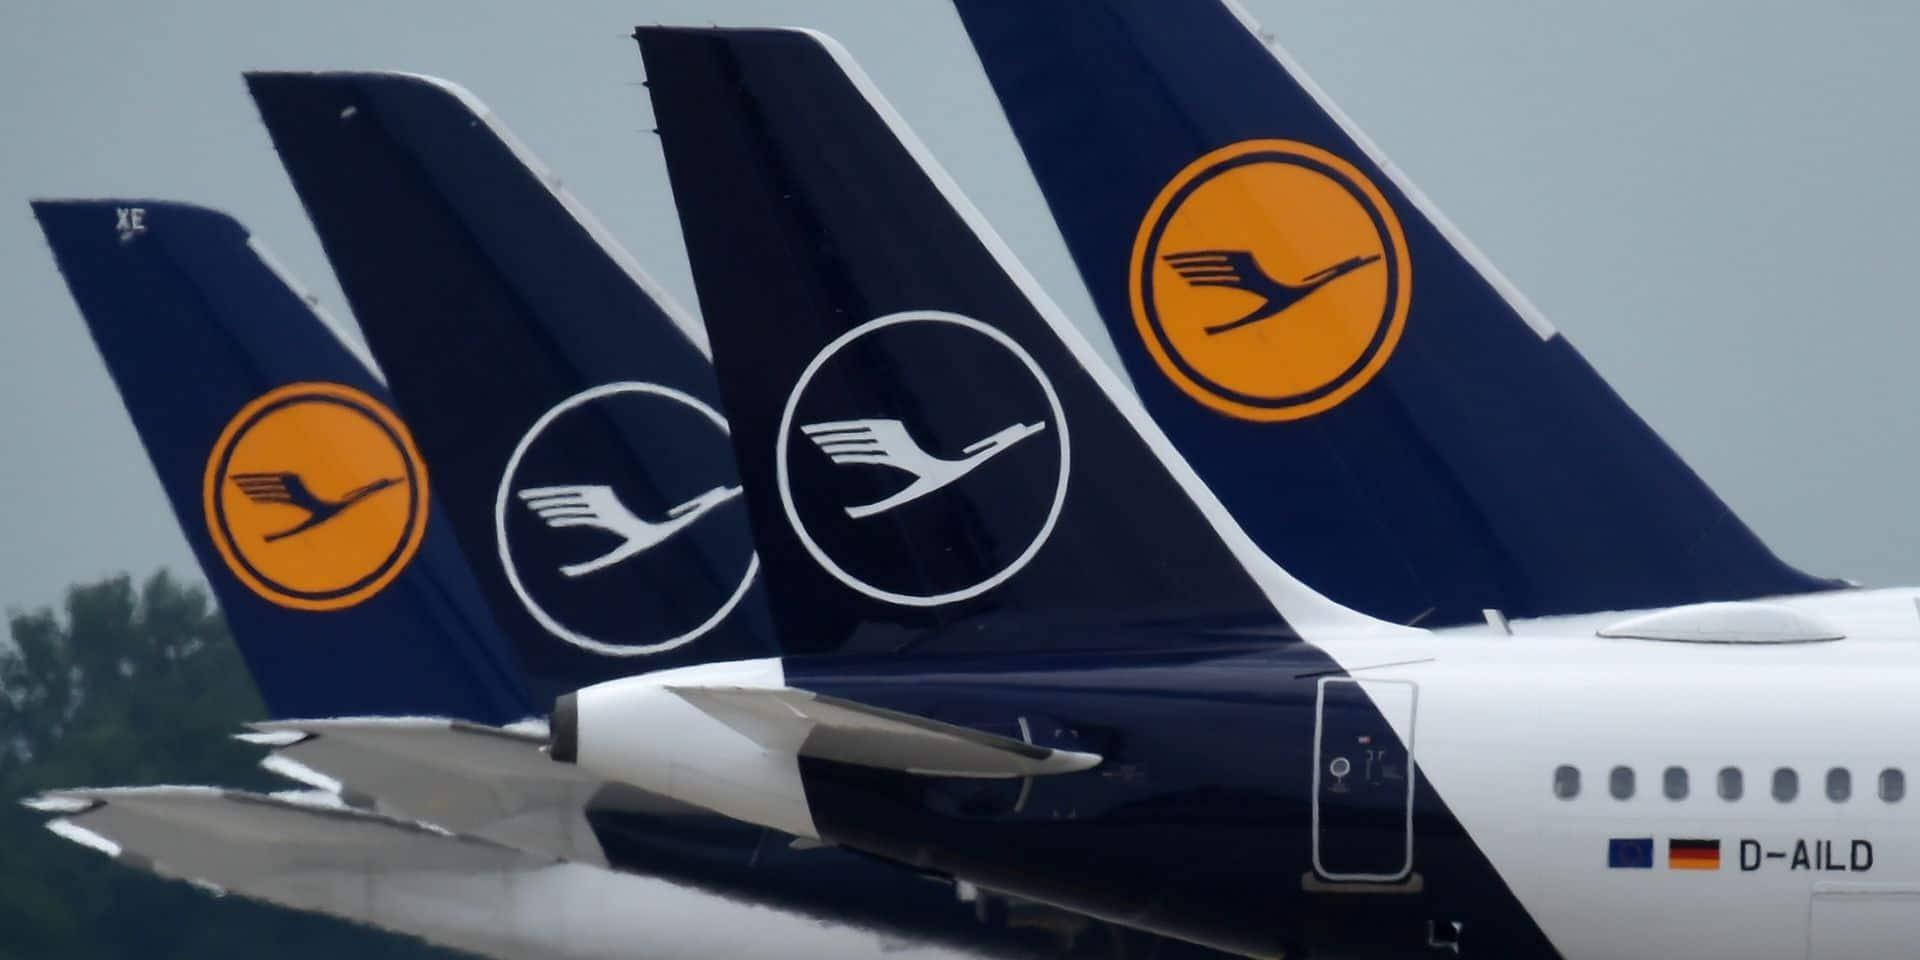 Pilotes de Lufthansa: pas de licenciements secs avant avril 2021